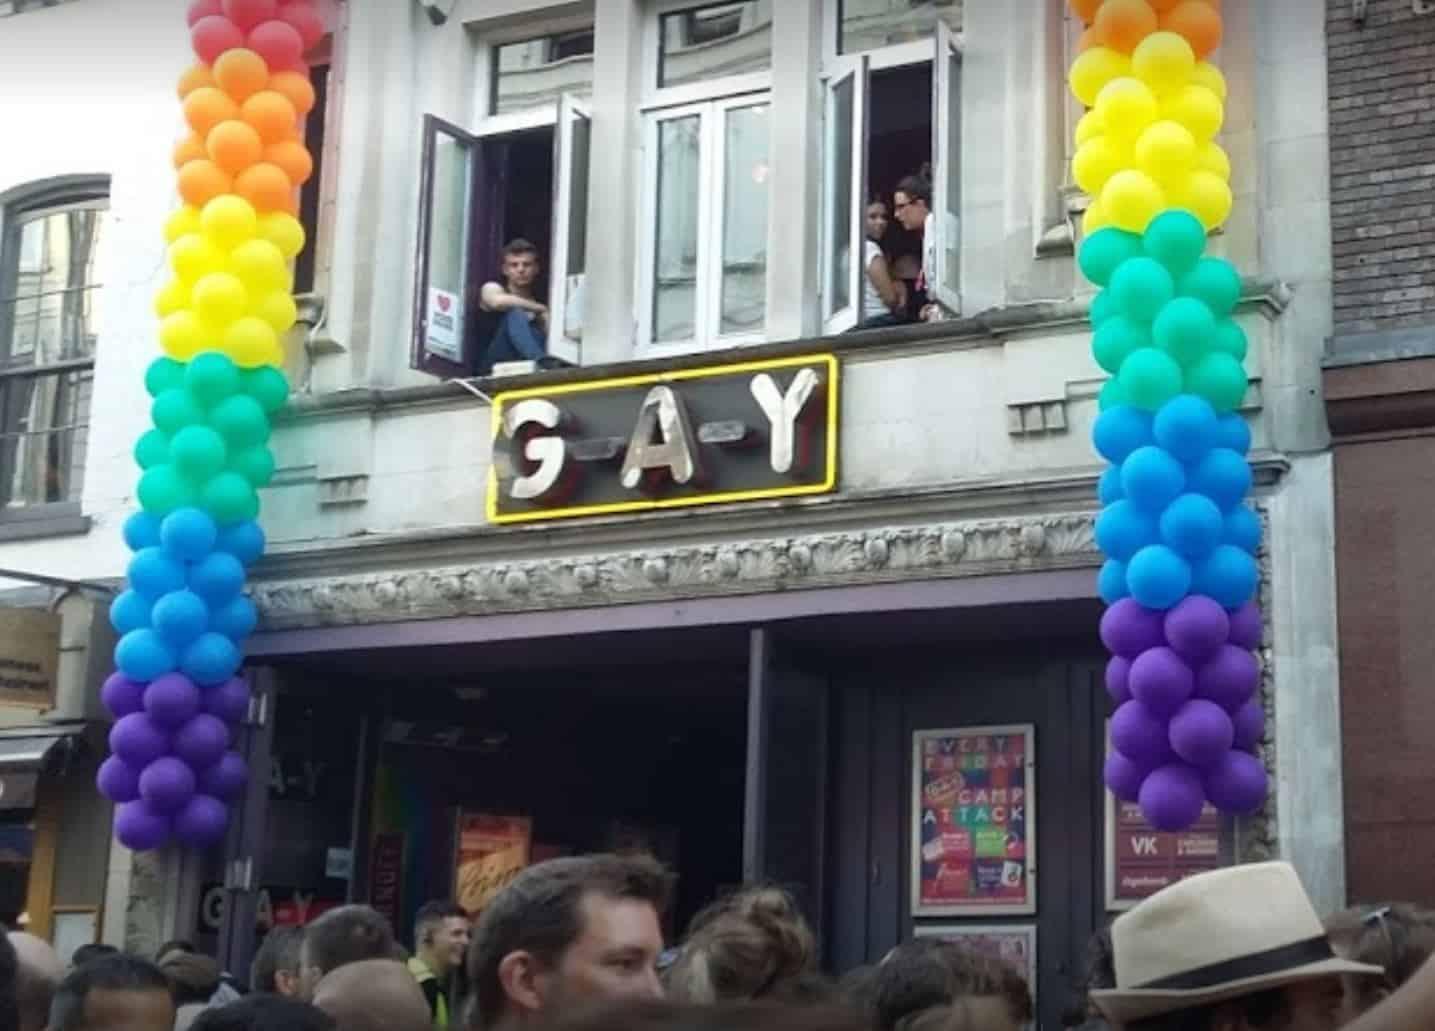 TravelGay recommandation G-A-Y bar